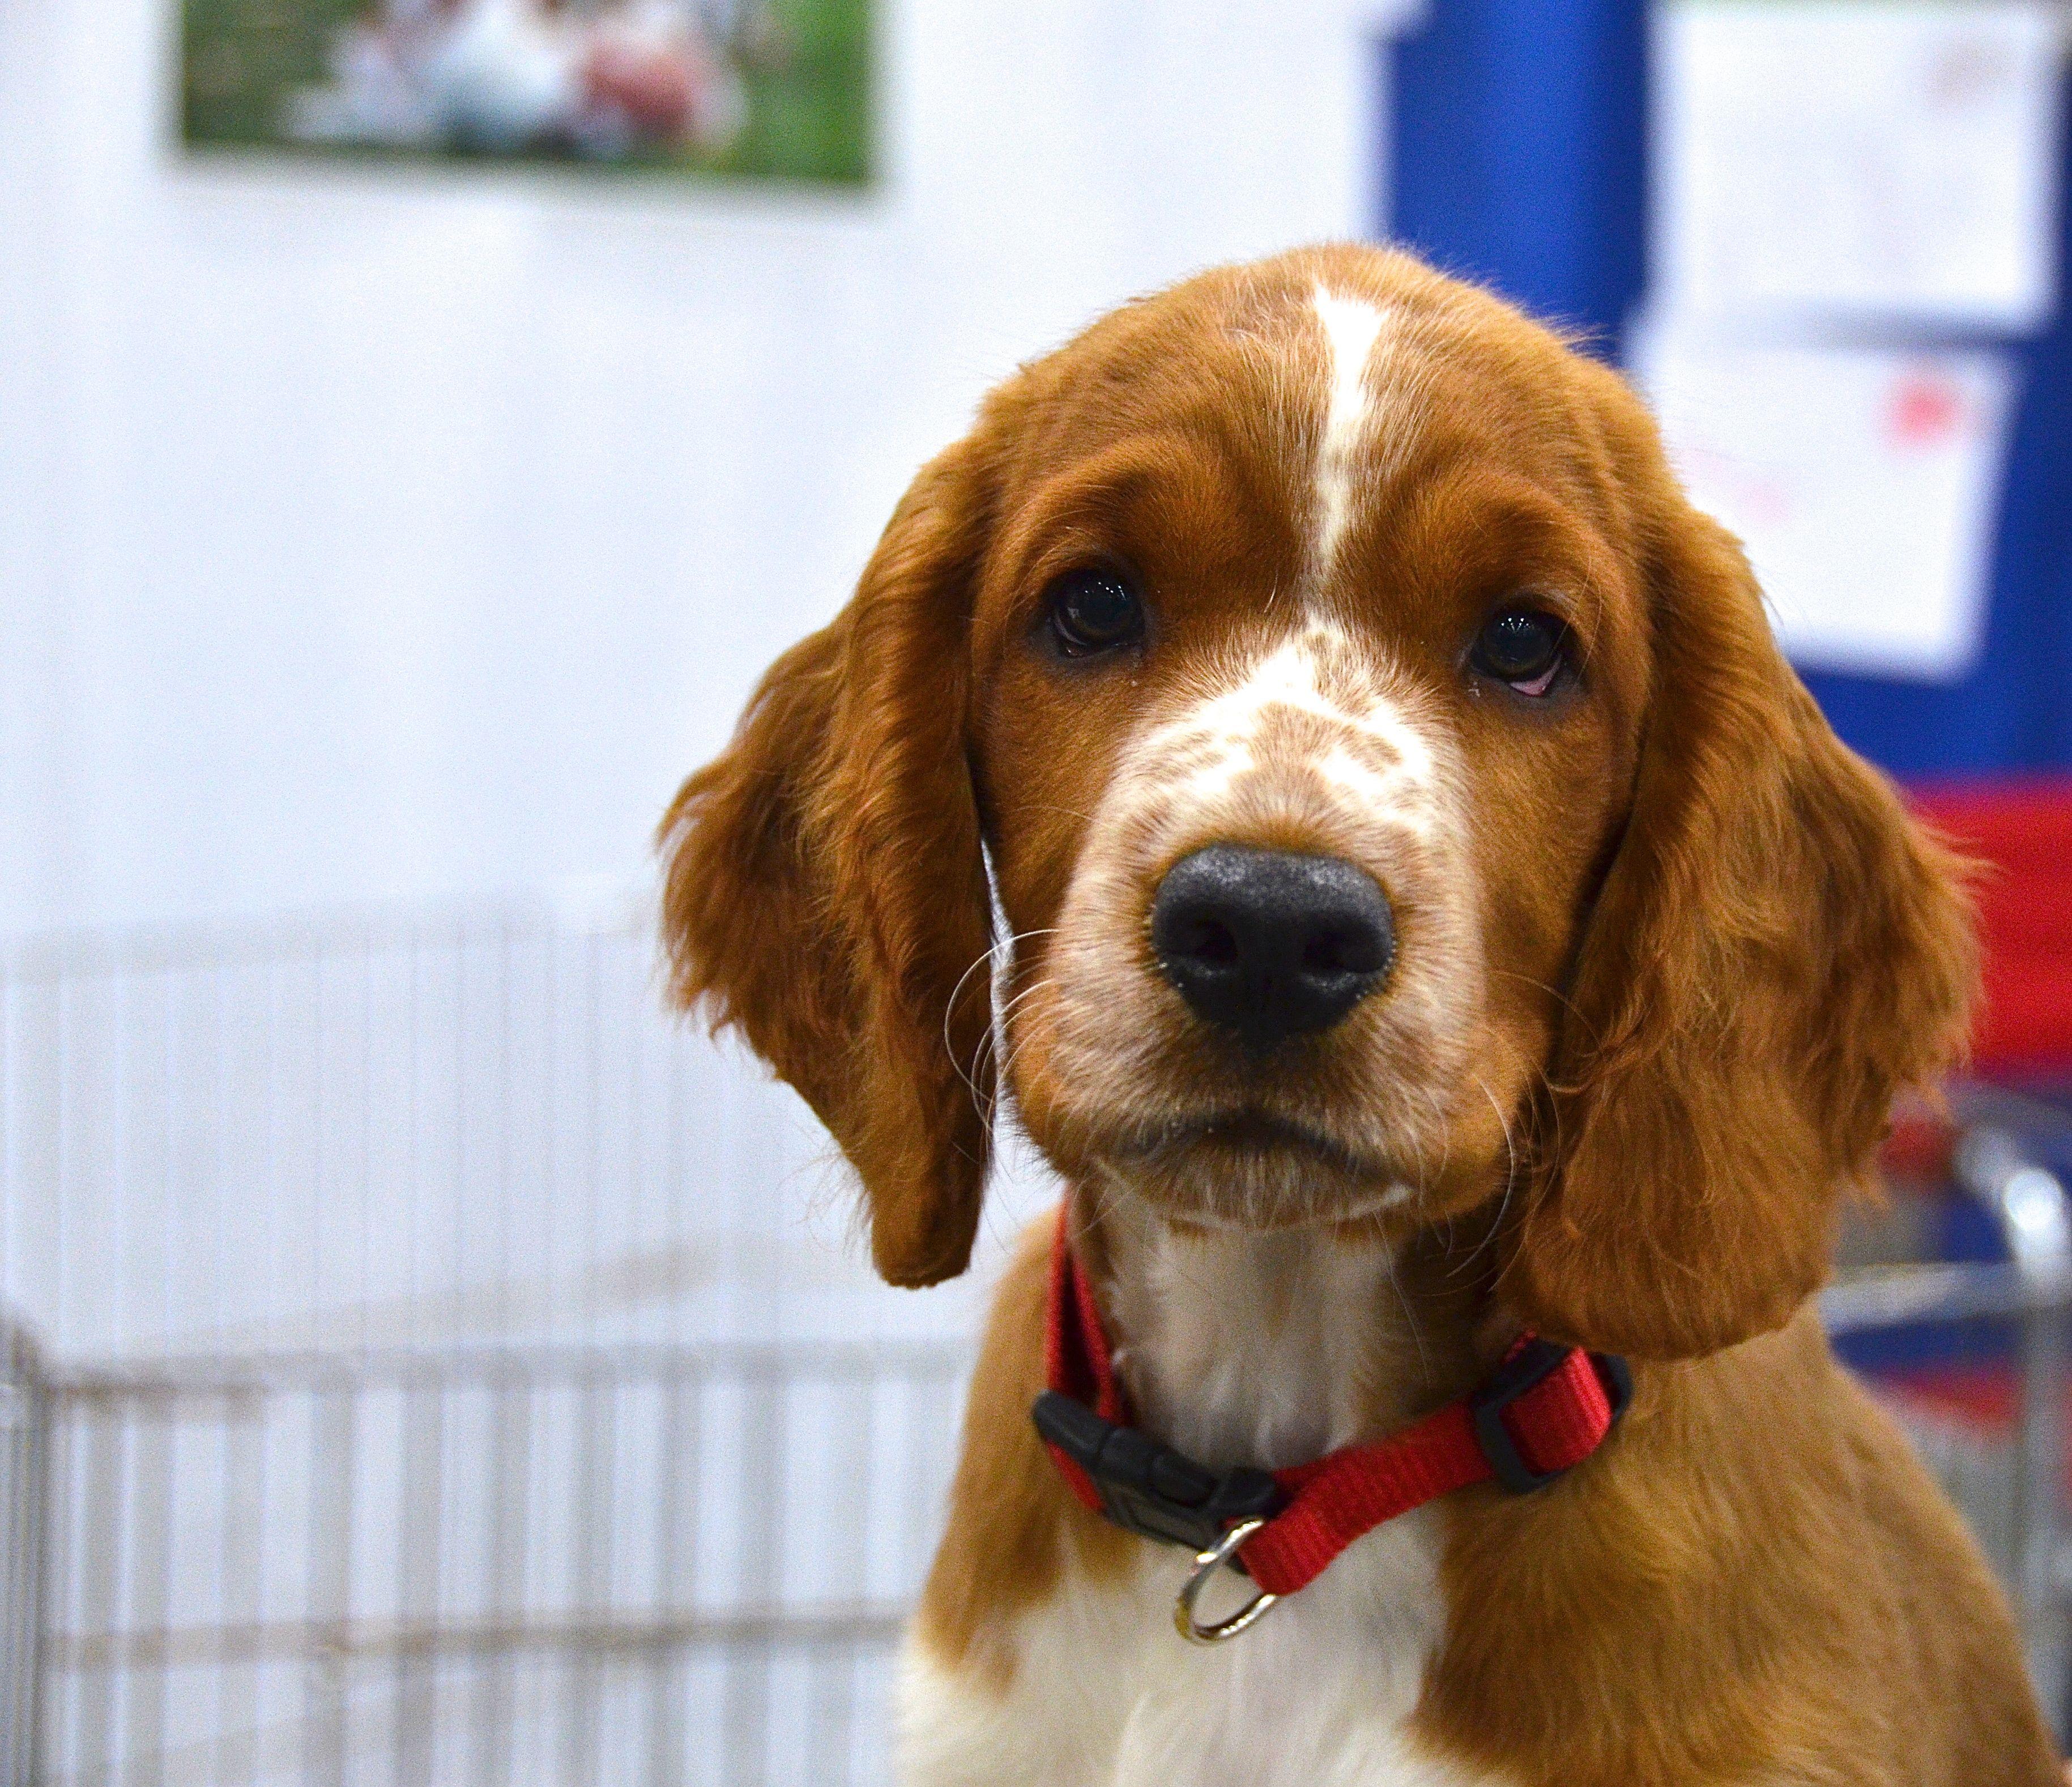 Welsh Springer Spaniel With Images Welsh Springer Spaniel Spaniel Puppies Dog Love